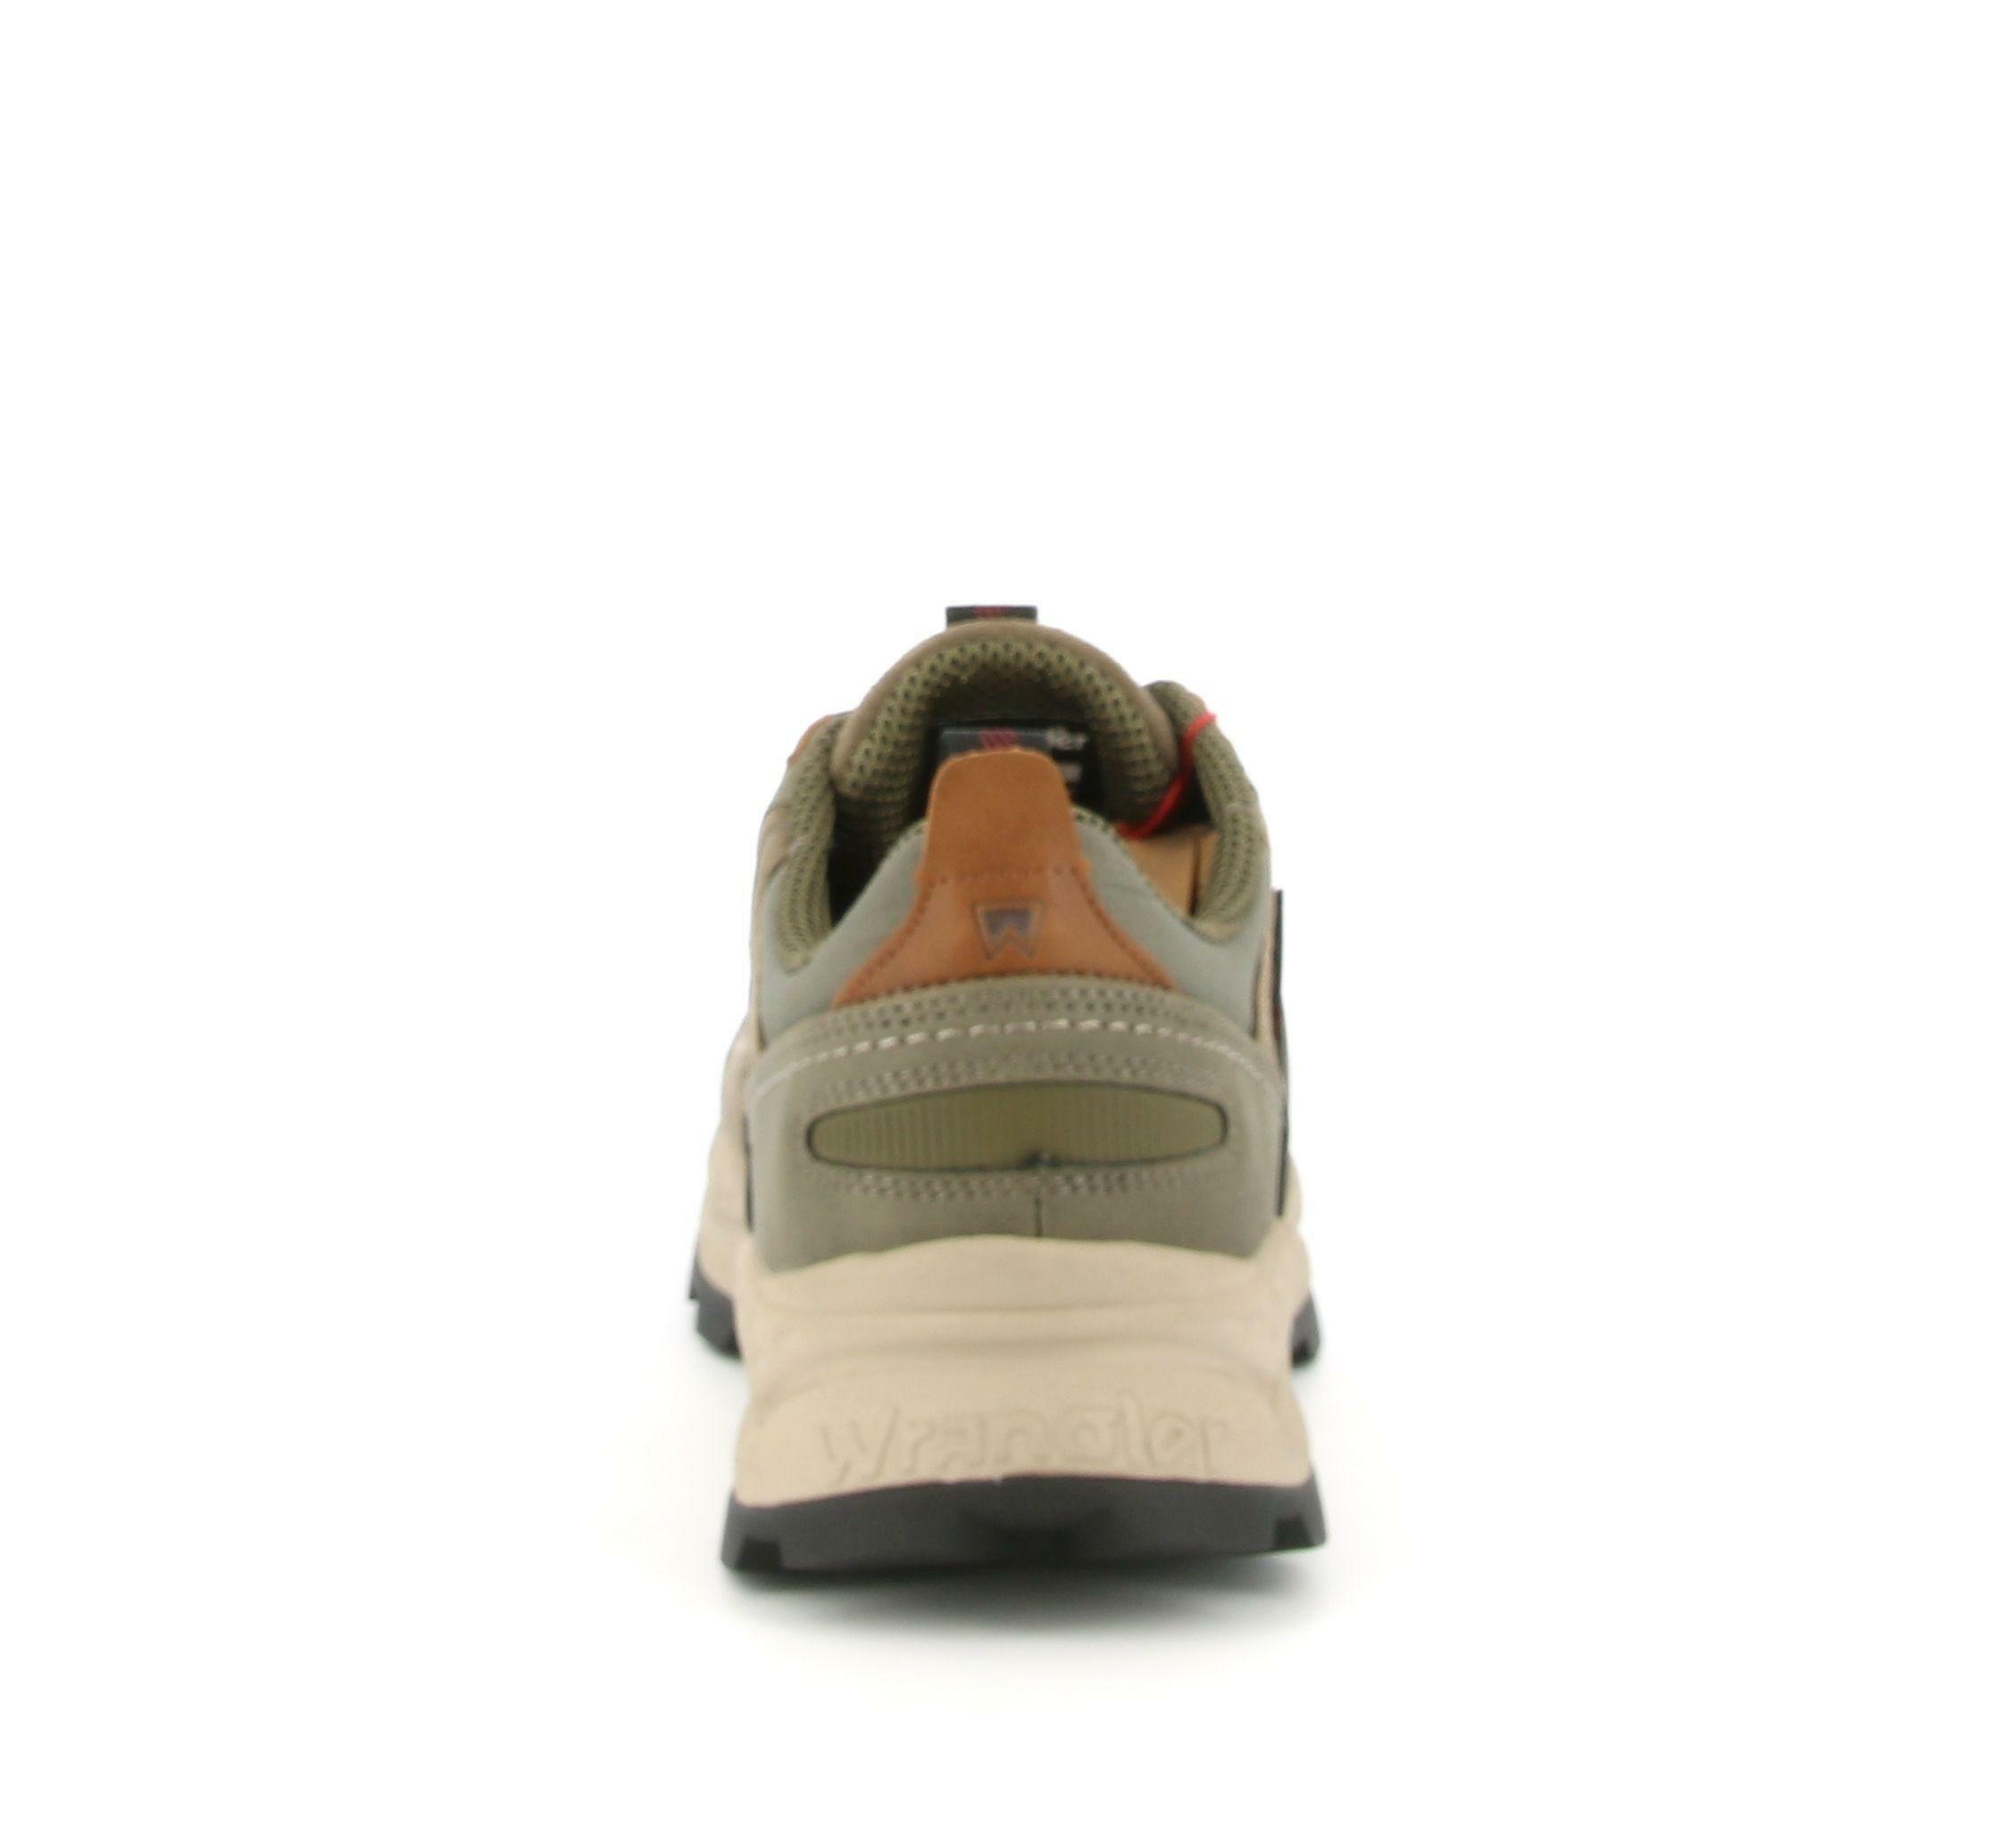 wrangler wrangler allacciato sportivo crossy city wm02151a verde scarpe da uomo